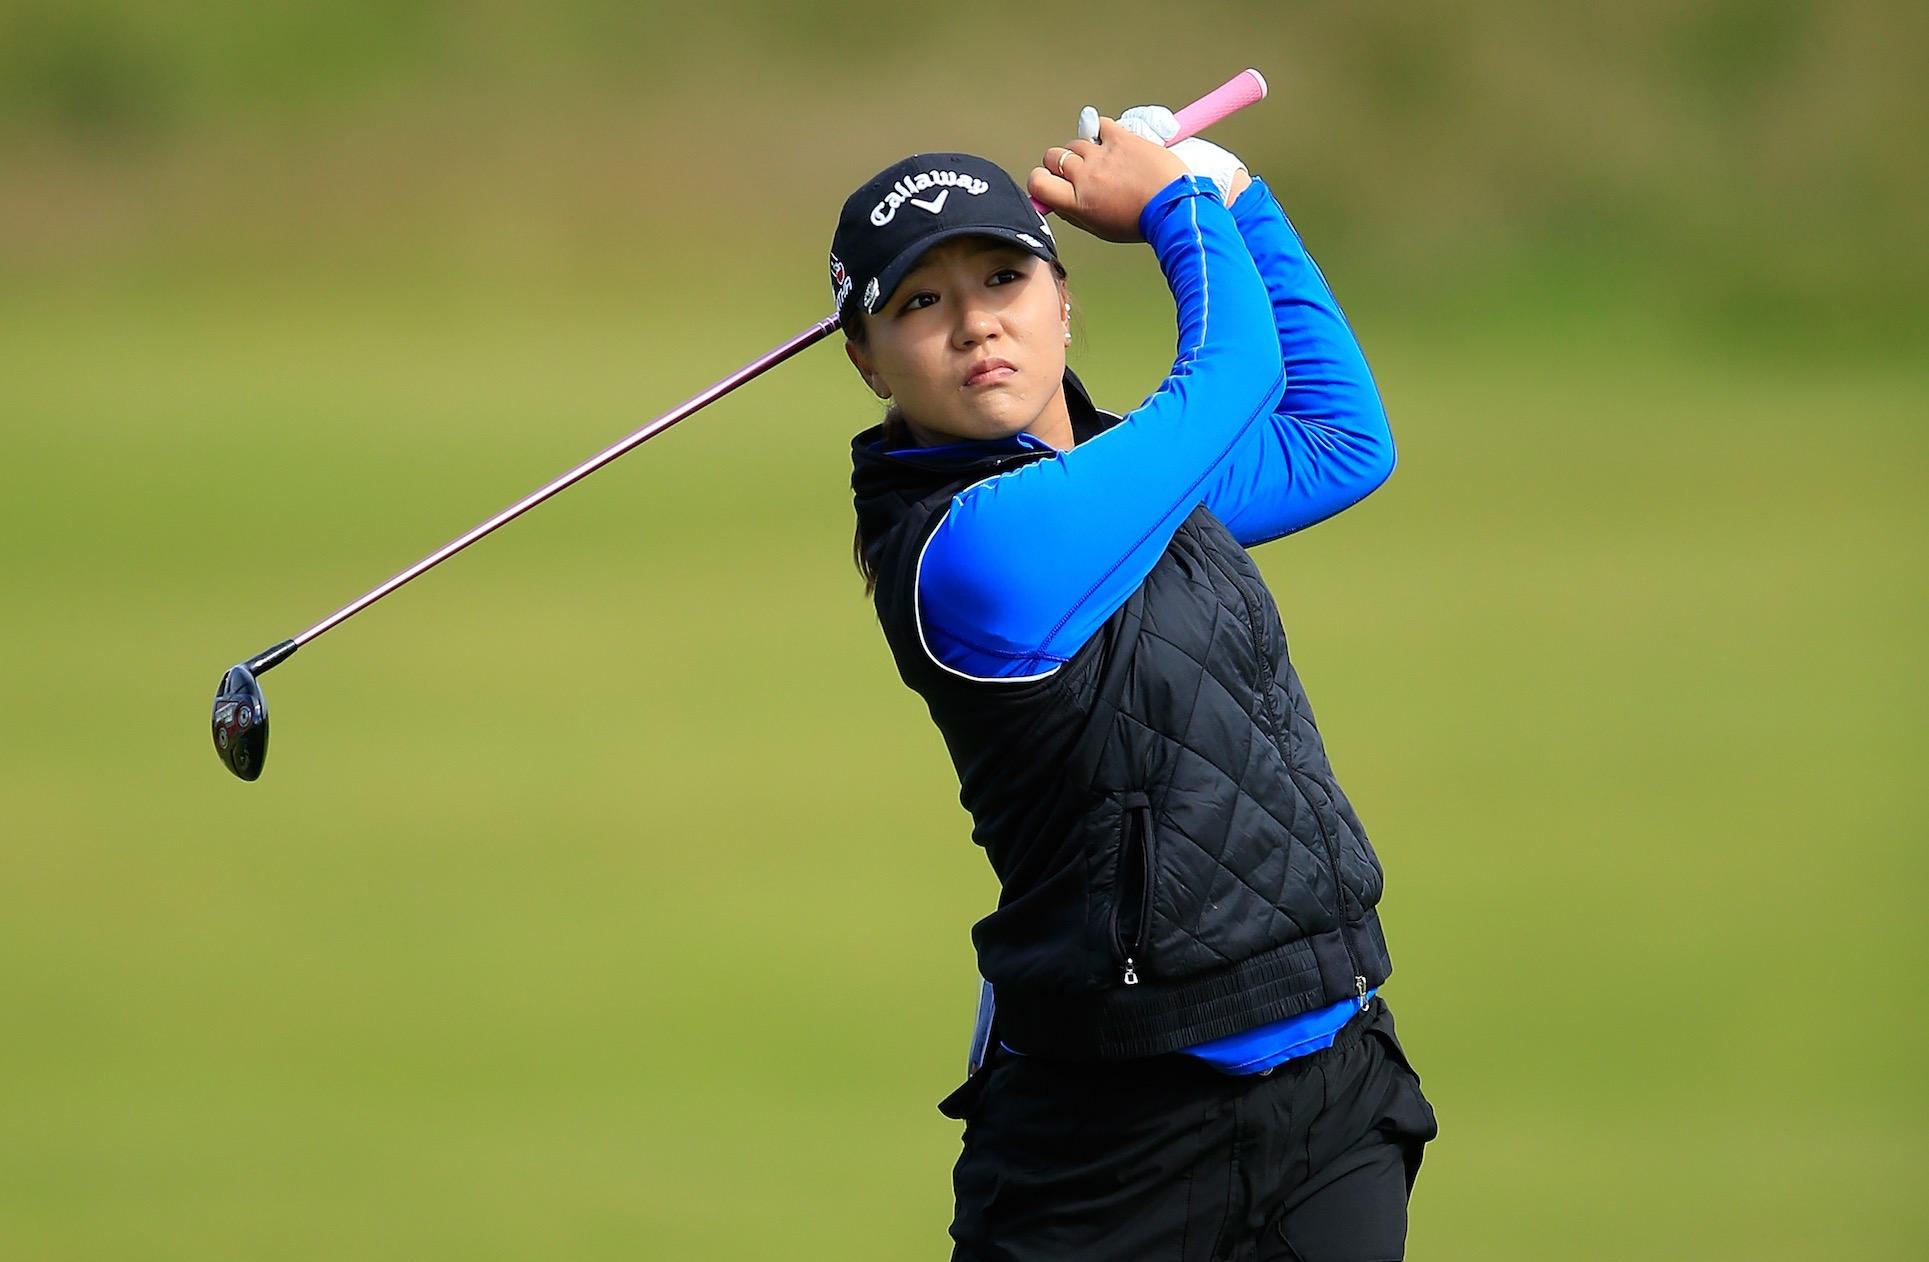 Ricoh Women's British Open First Round Recap